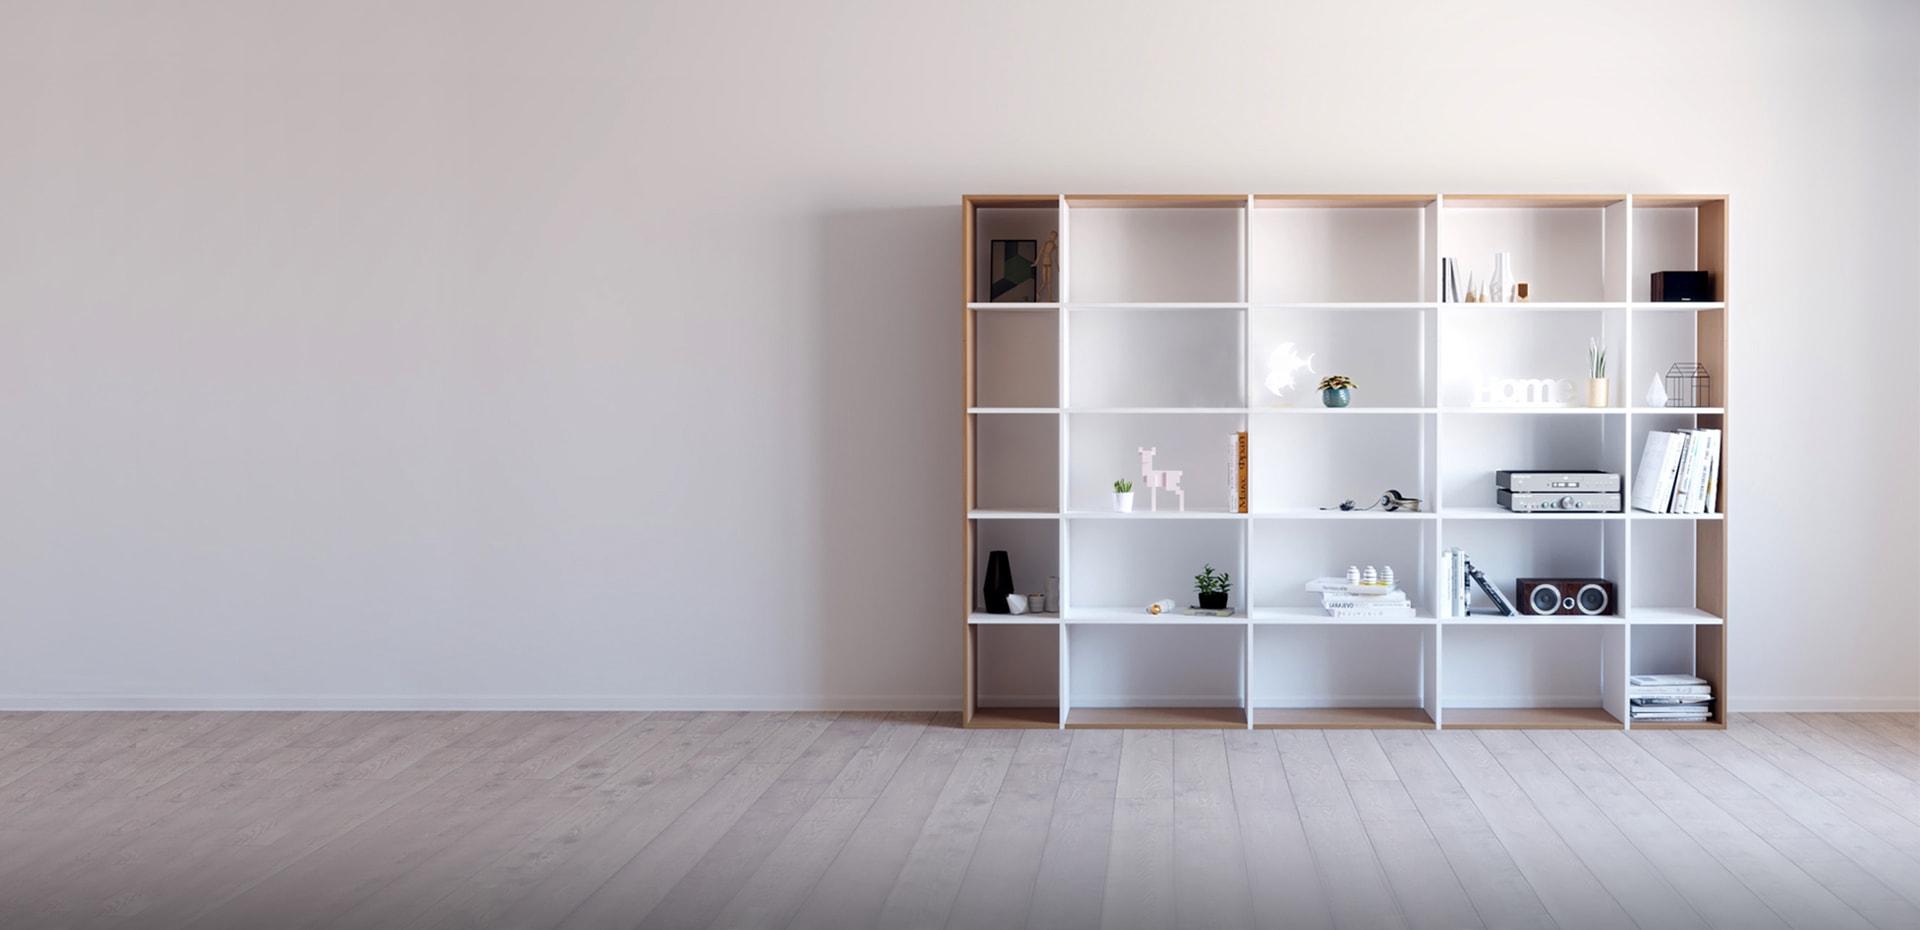 holzregale selbst gestalten regale bei mycs mycs deutschland. Black Bedroom Furniture Sets. Home Design Ideas